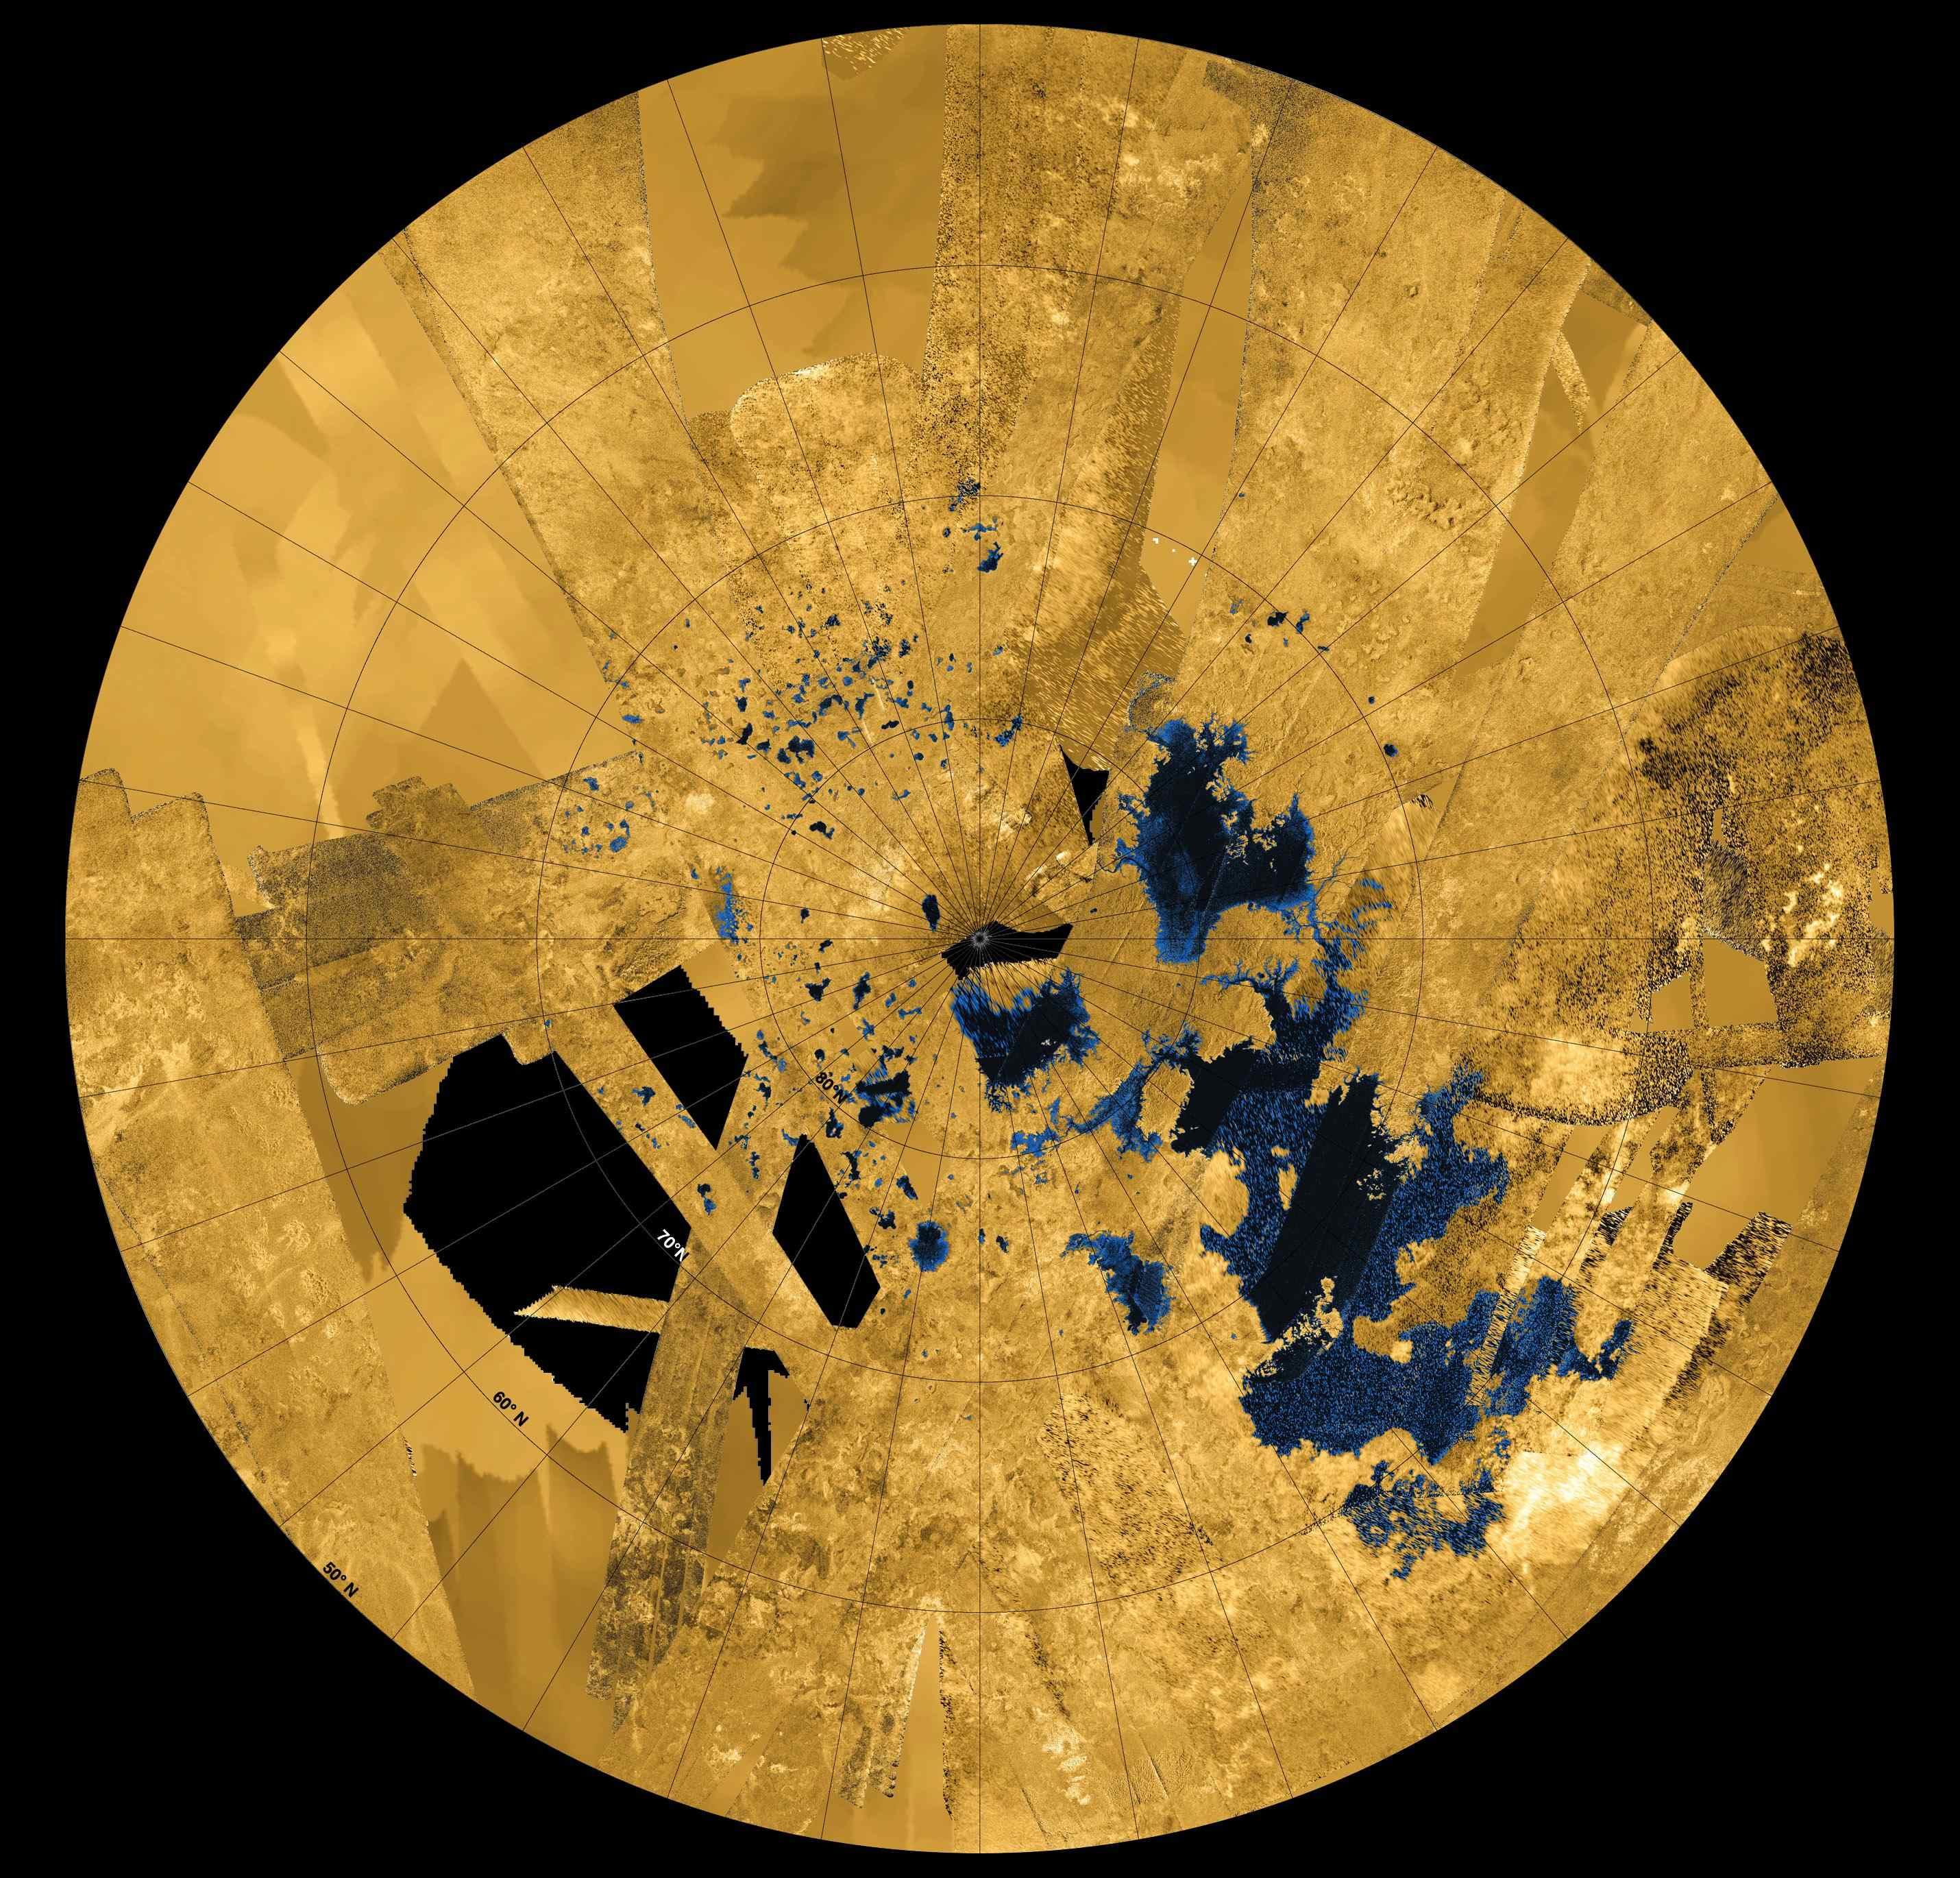 Gaia Liftoff, Titan's Seas and More